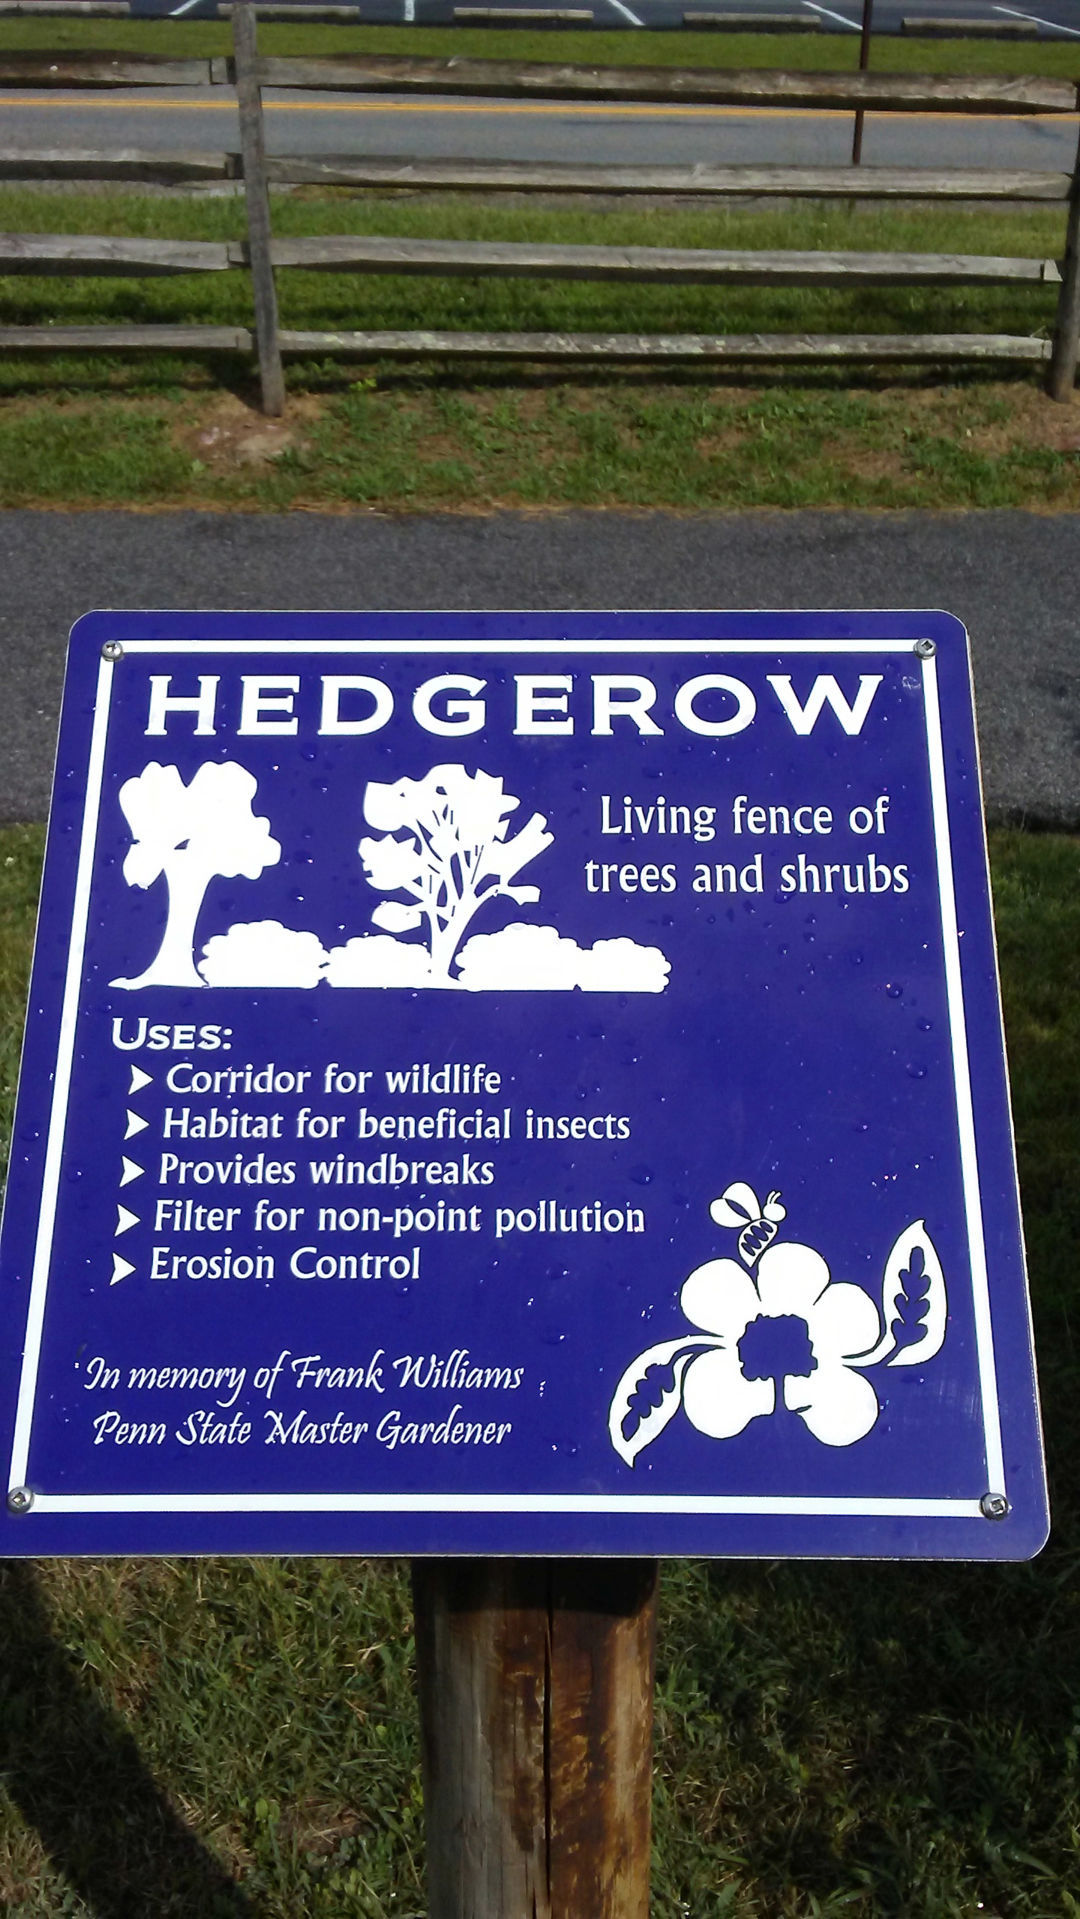 2019-07-26-hedgerow sign.jpg